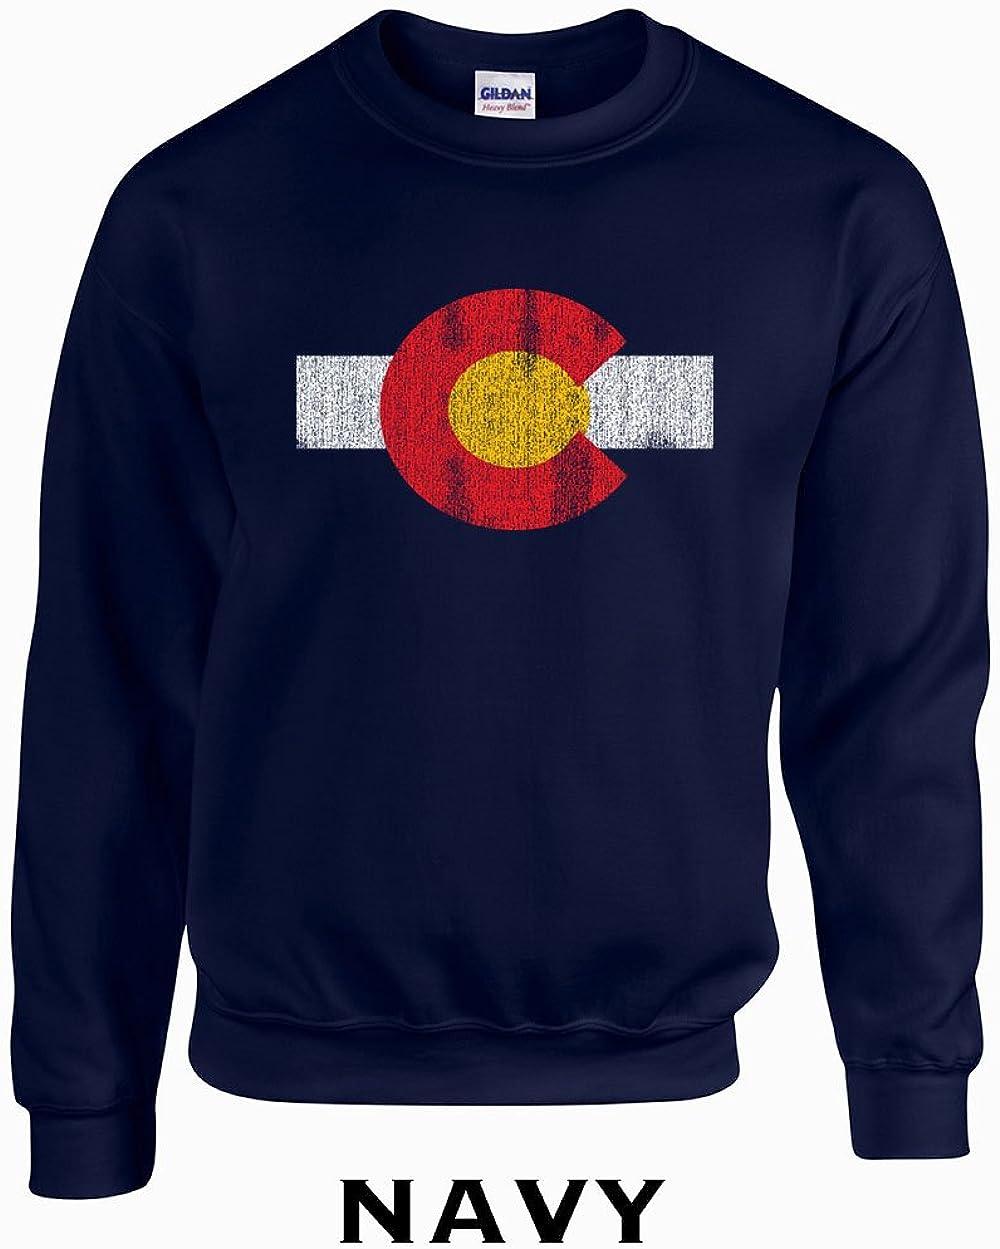 Swaffy Tees 451 Colorado Flag Funny Hooded Sweatshirt